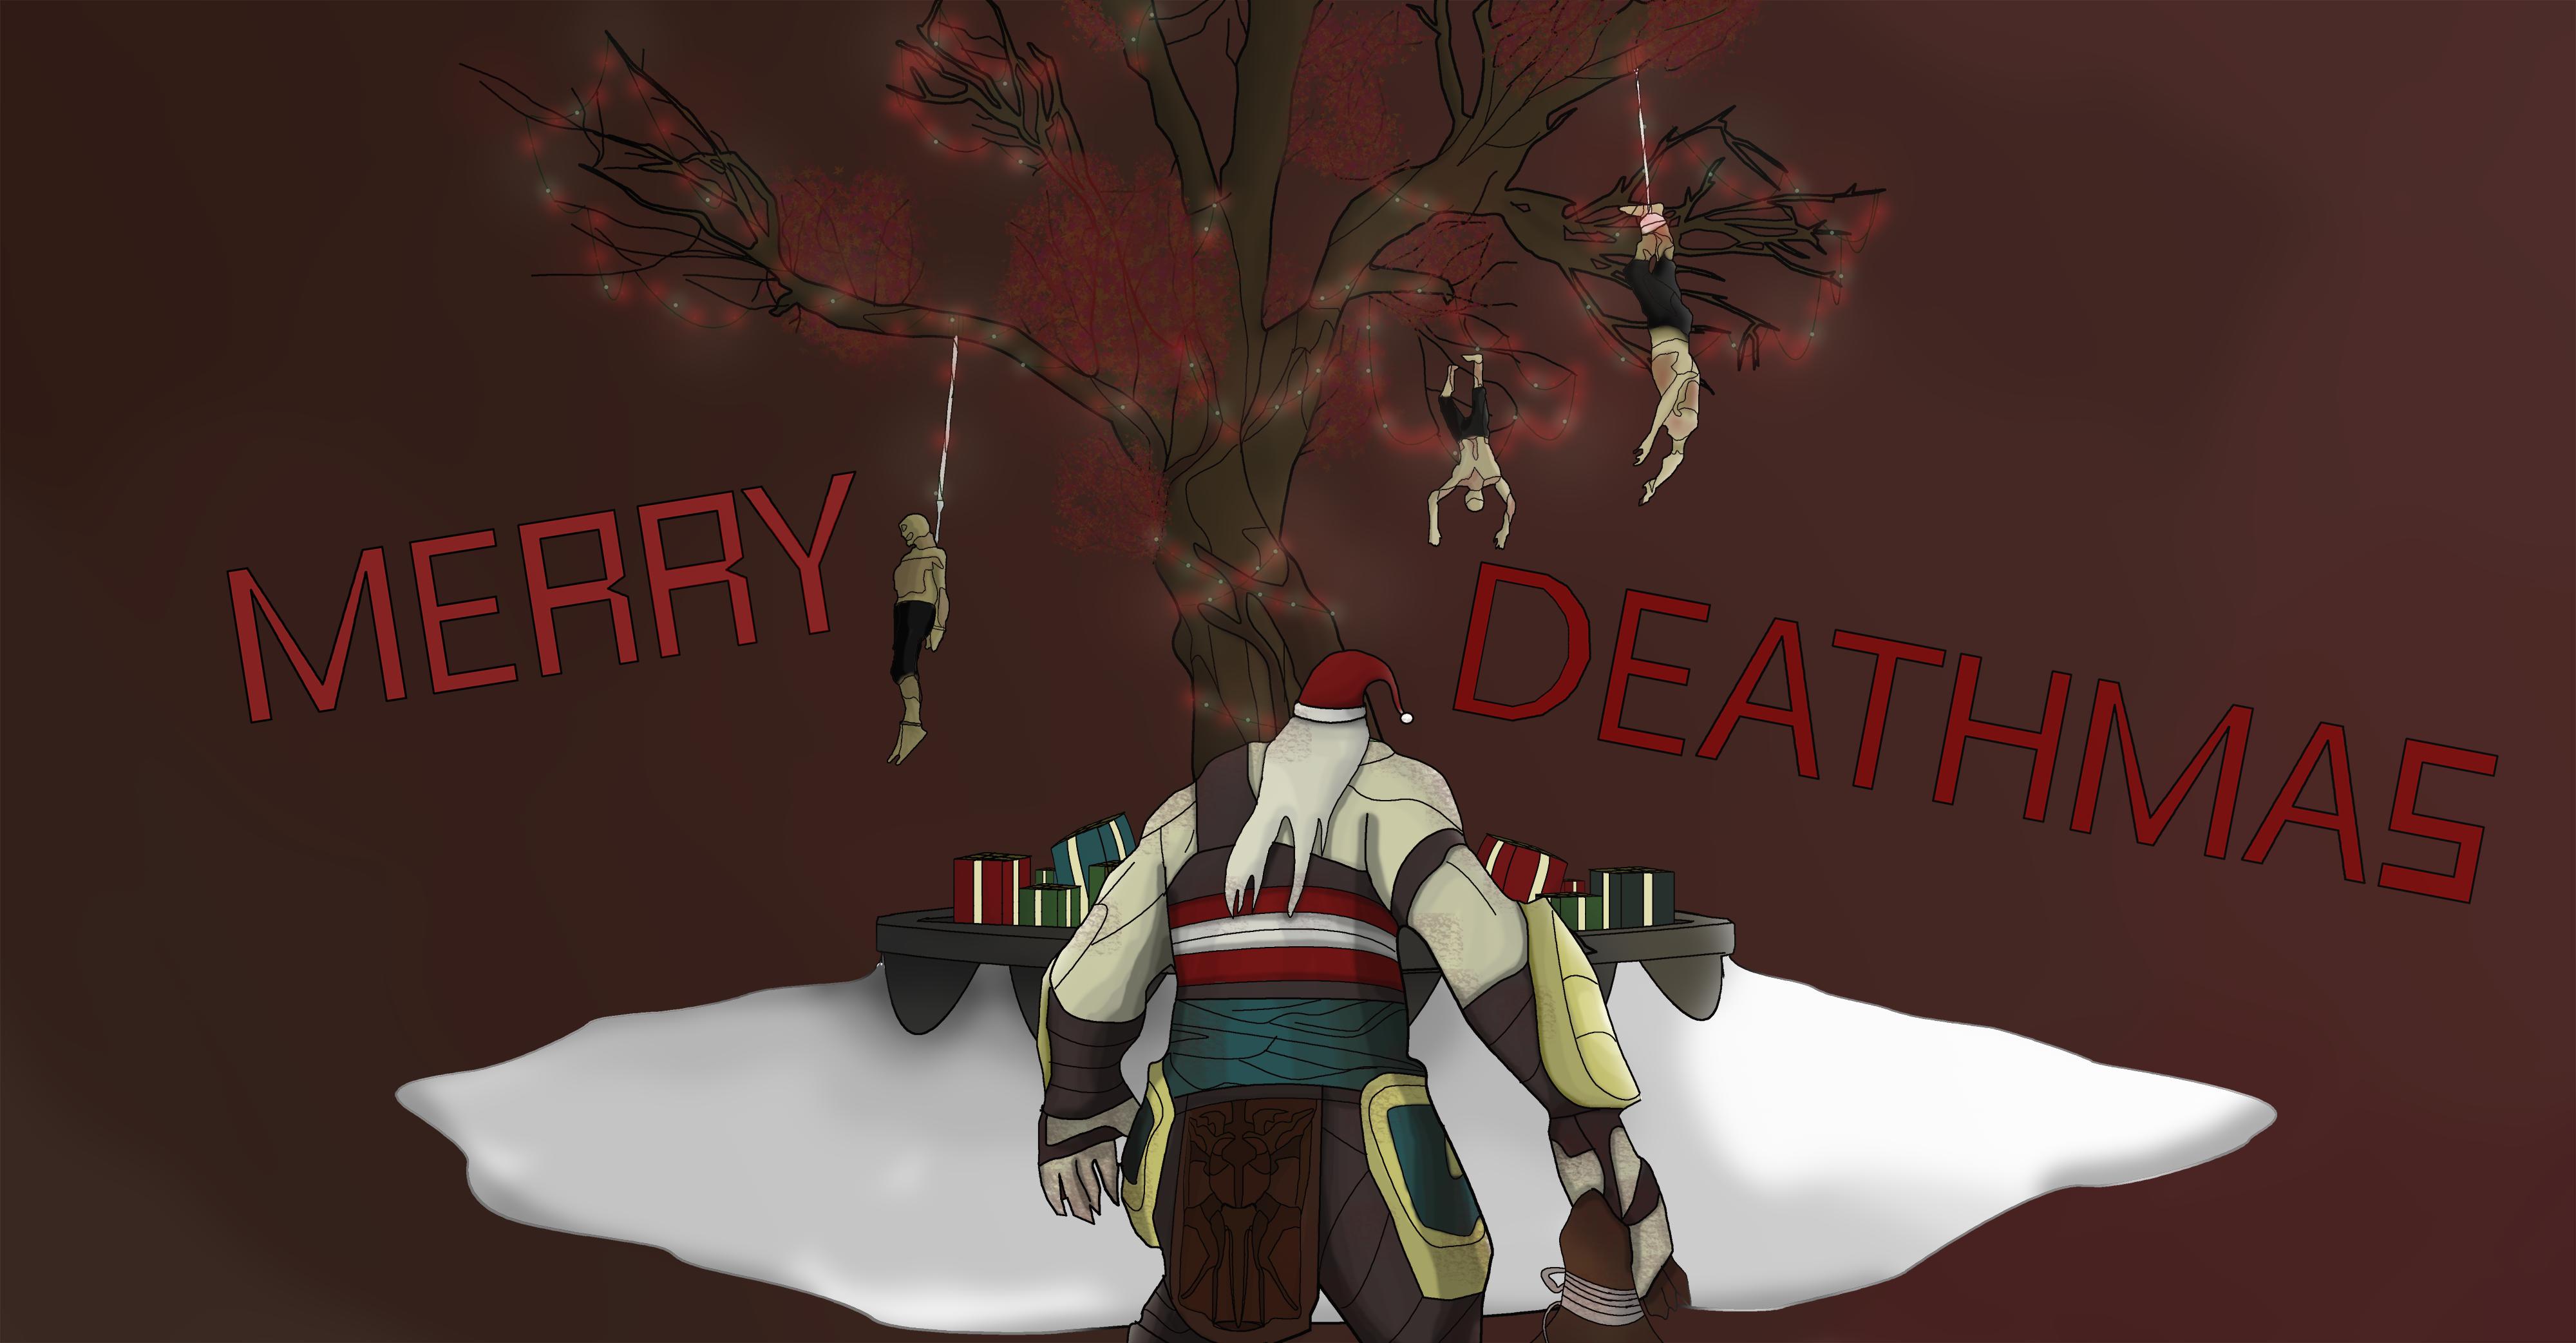 MERRY DEATHMAS!